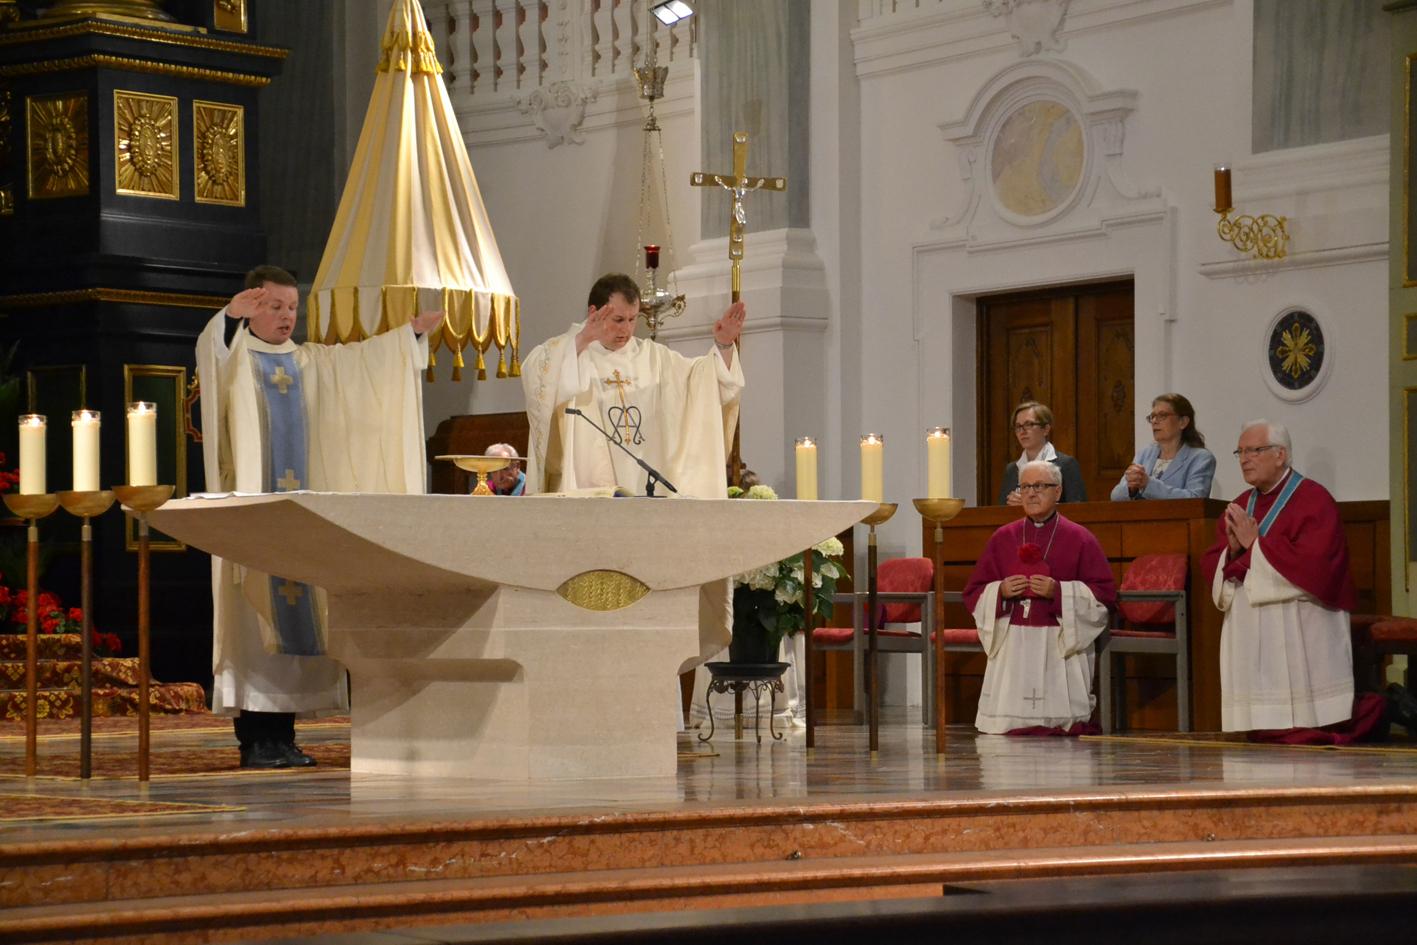 2020 07 03 neupriester in altoetting dankwallfahrt2